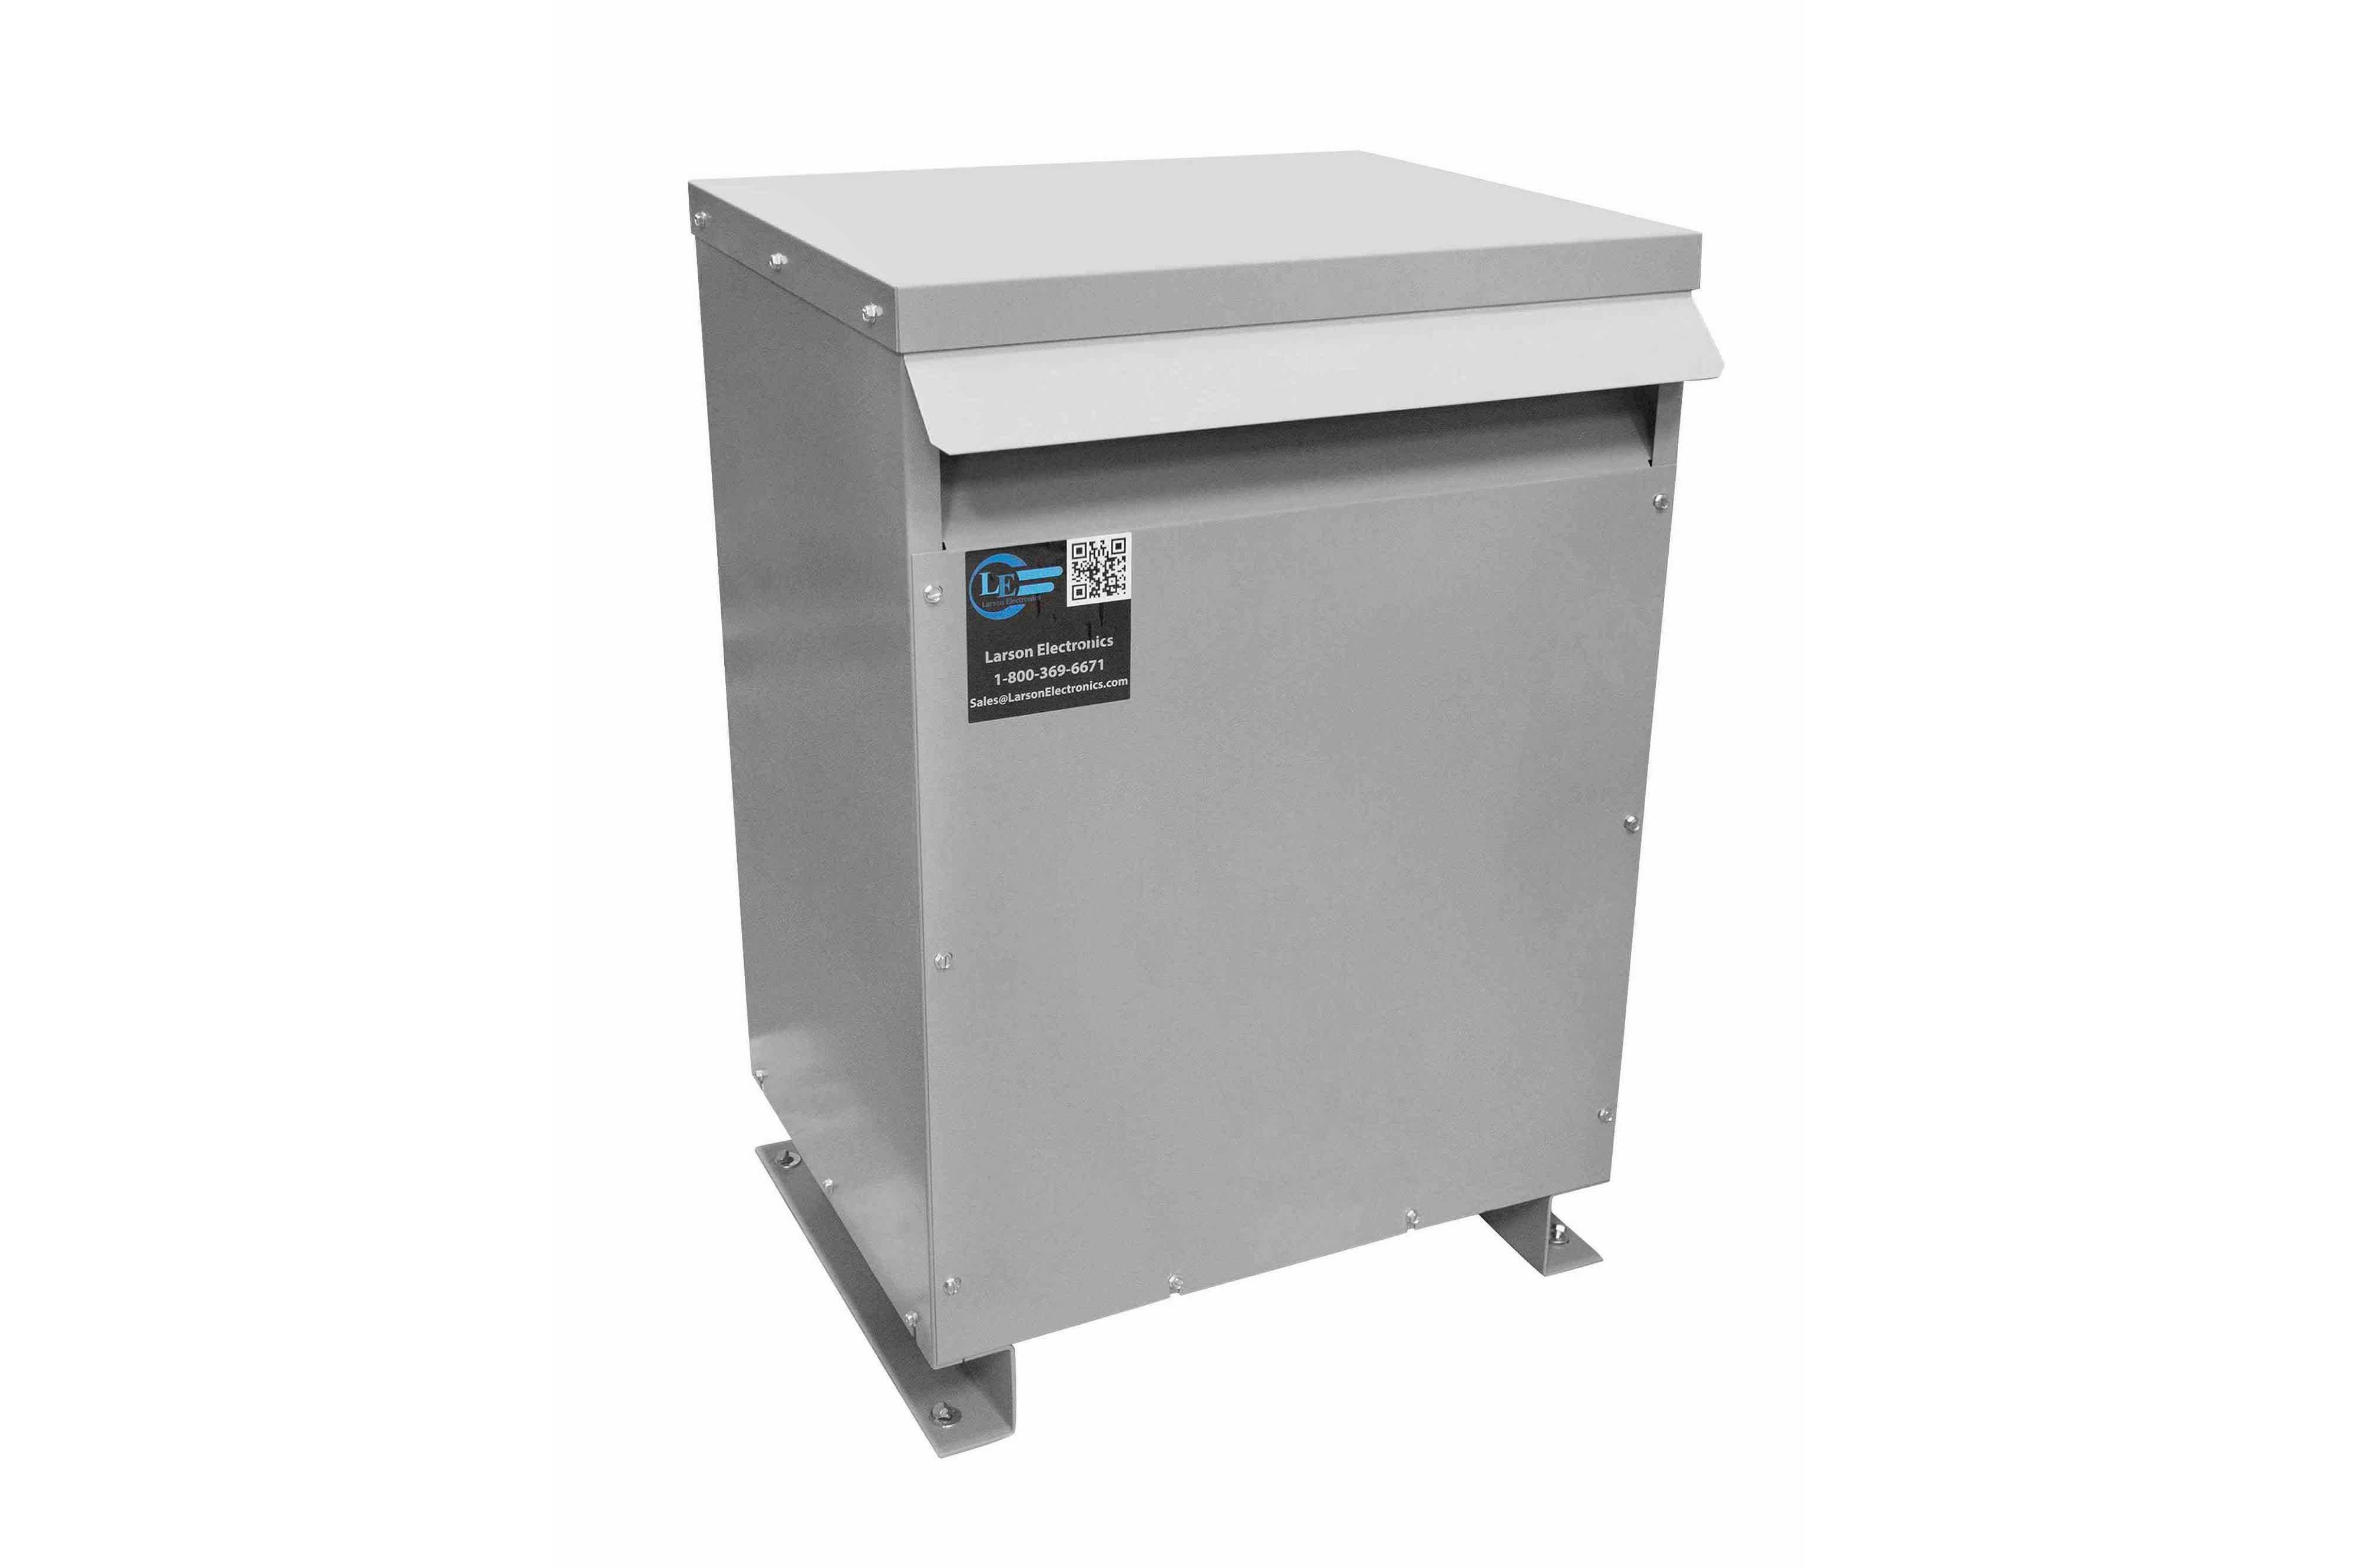 60 kVA 3PH DOE Transformer, 480V Delta Primary, 208Y/120 Wye-N Secondary, N3R, Ventilated, 60 Hz